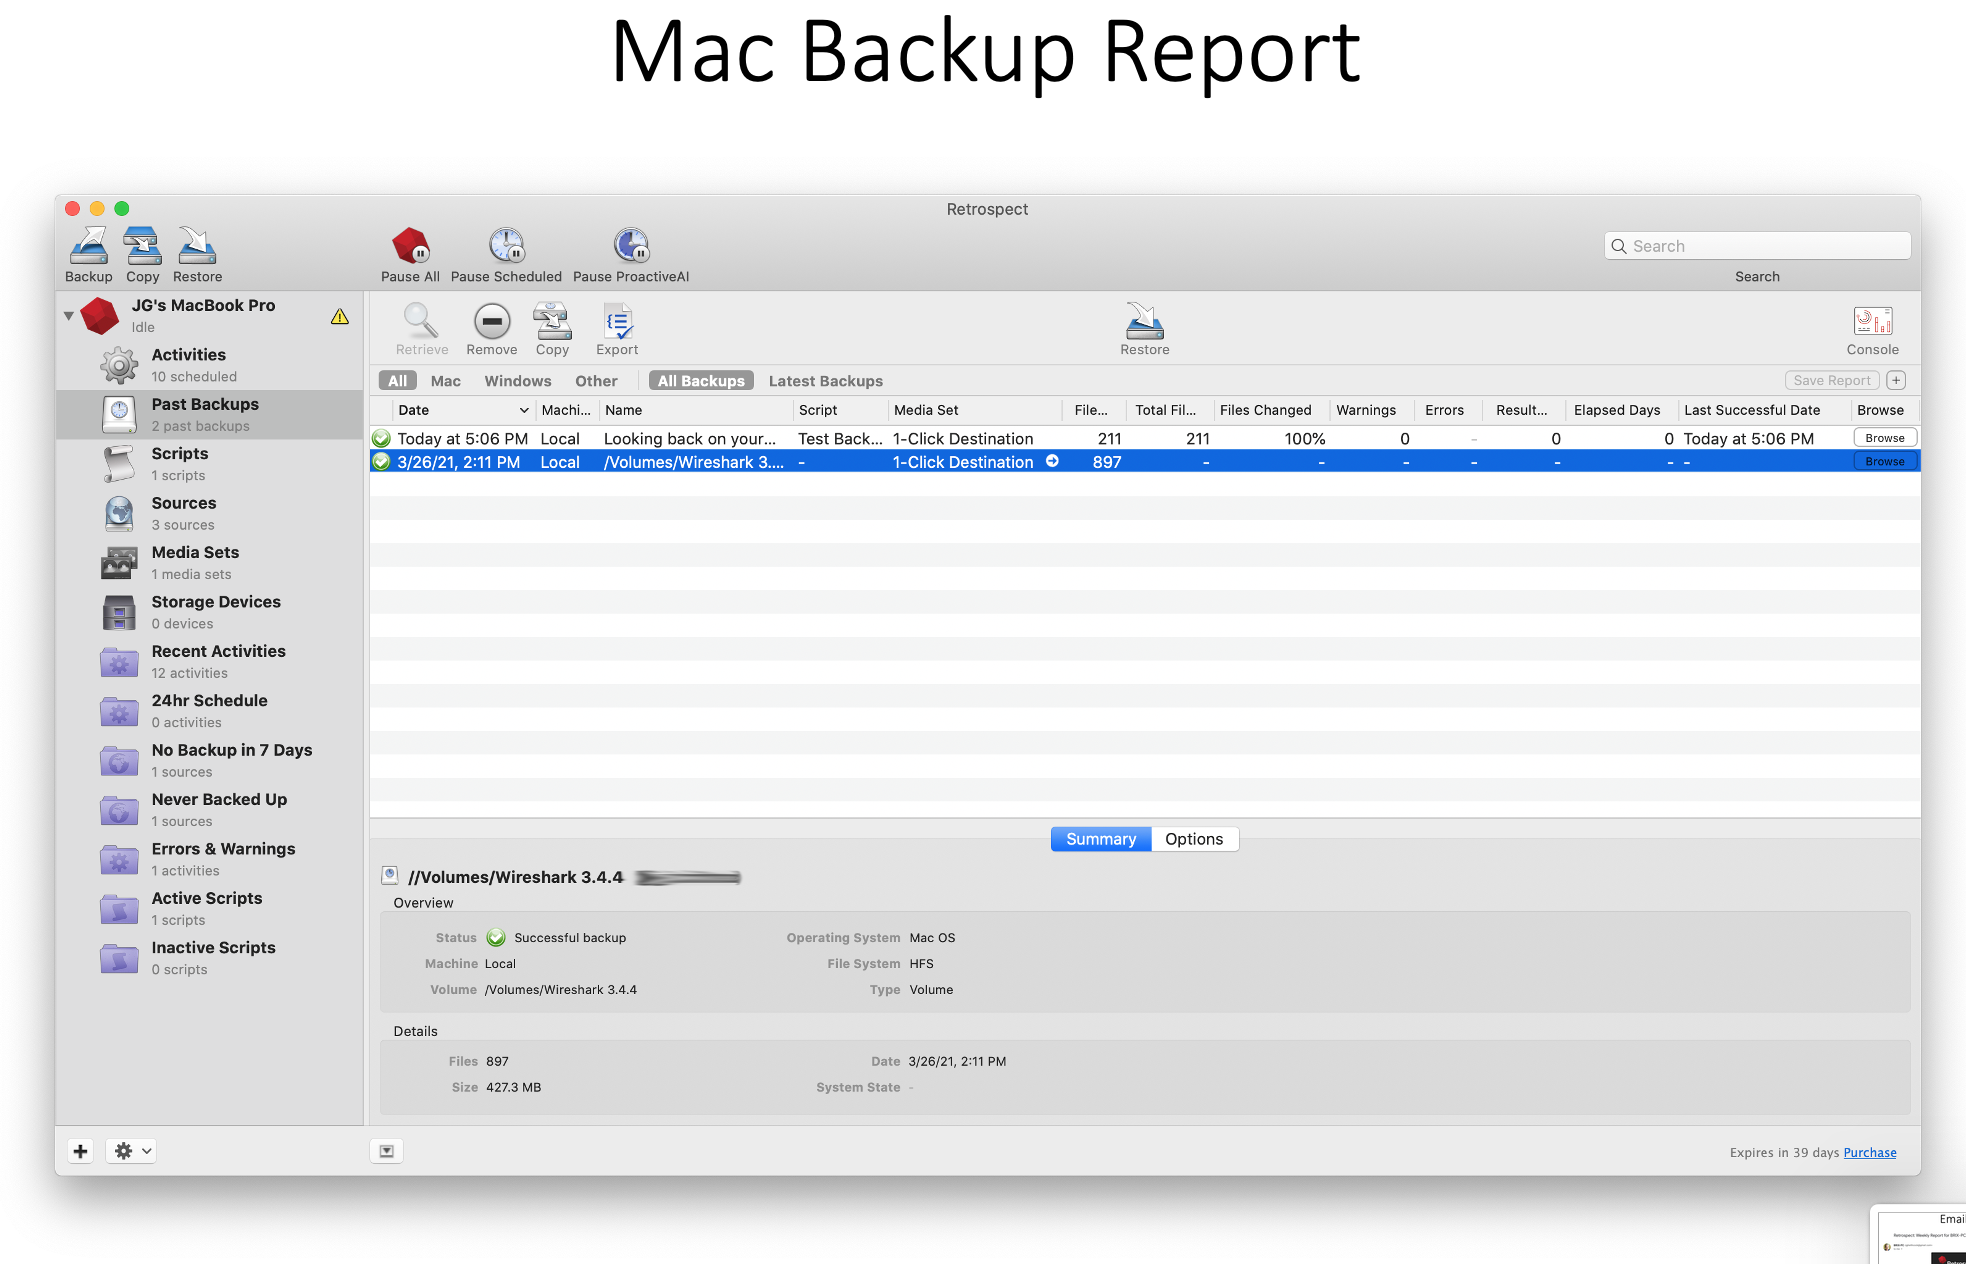 Retrospect 2021 reporting mac